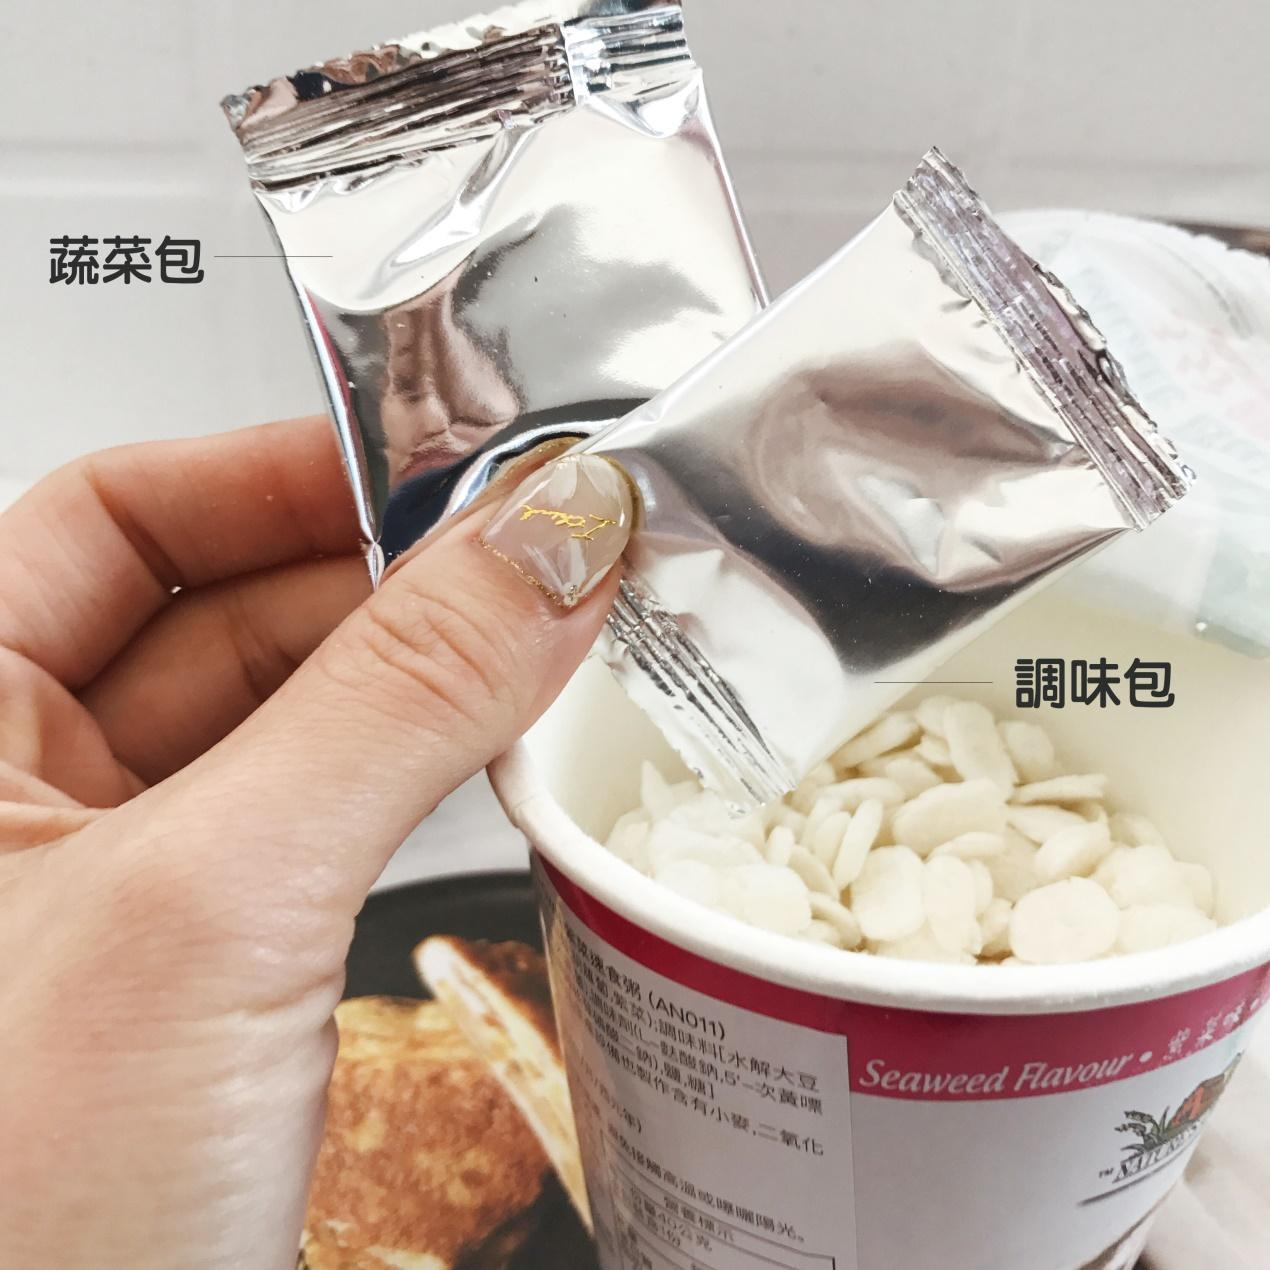 C:\Users\marketing05\Desktop\馬來西亞 NATUERS OWN~速食粥\1.jpg